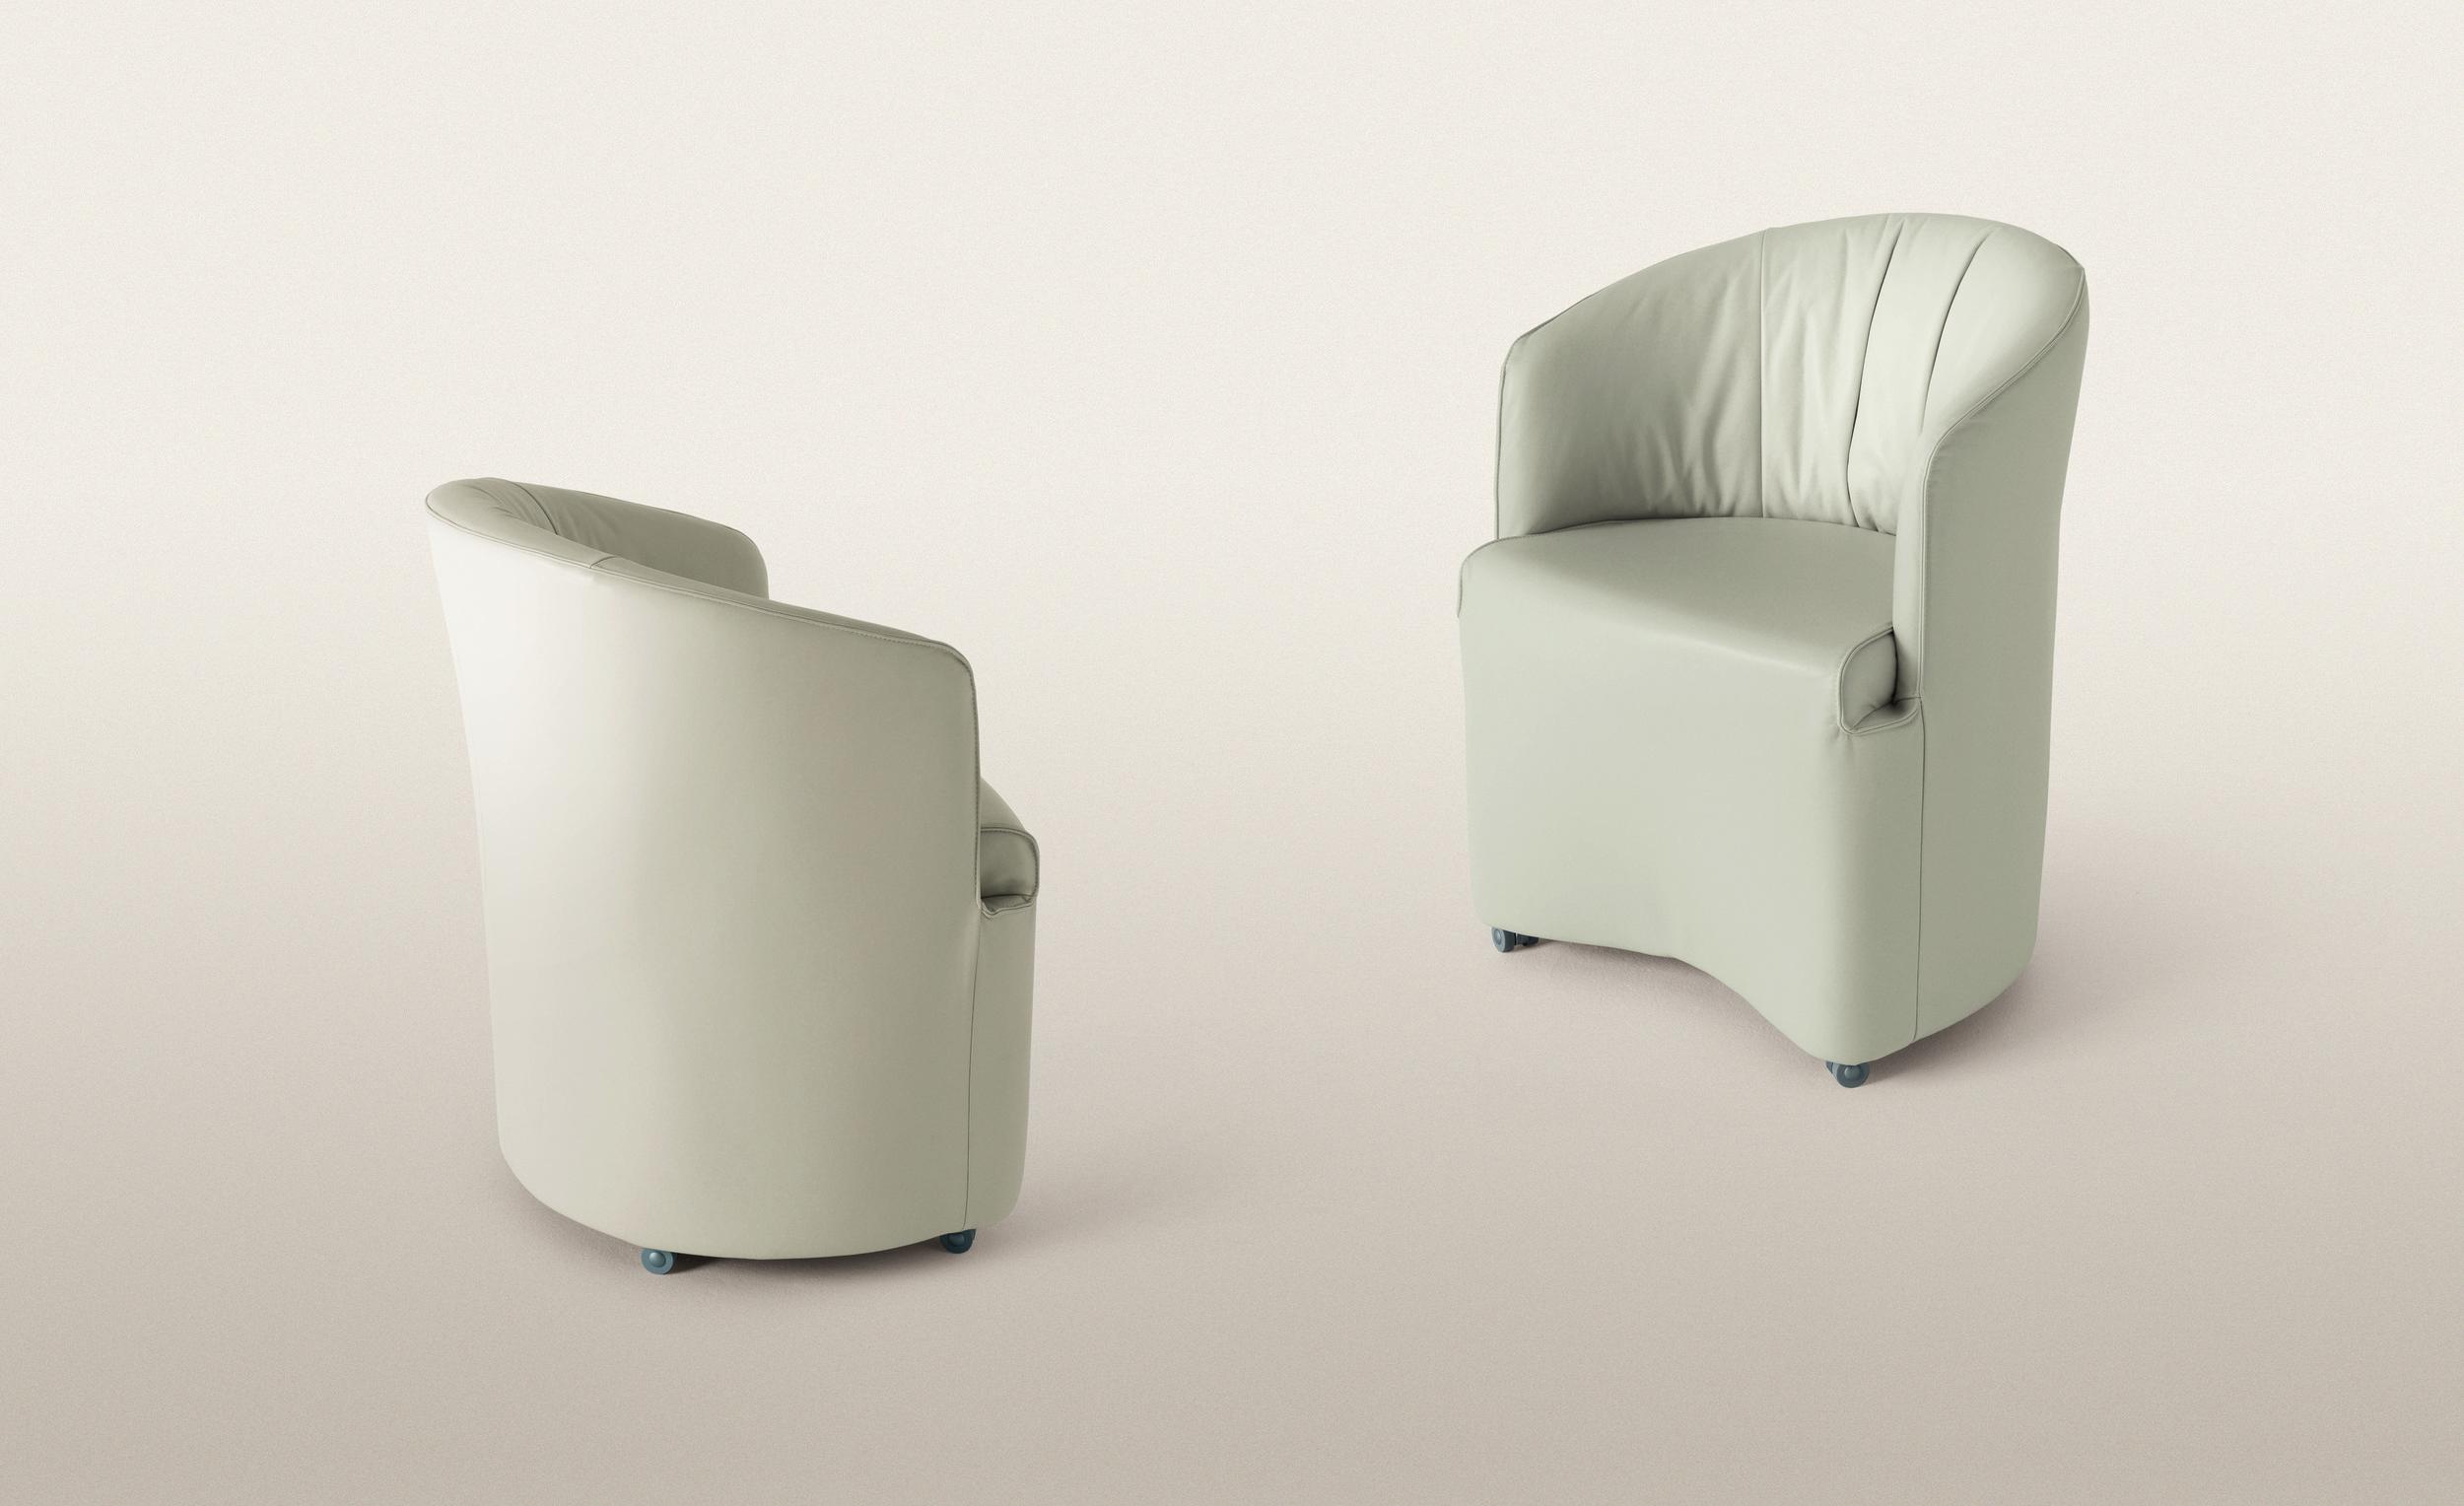 opera-dinner-chair-03-HR.jpg